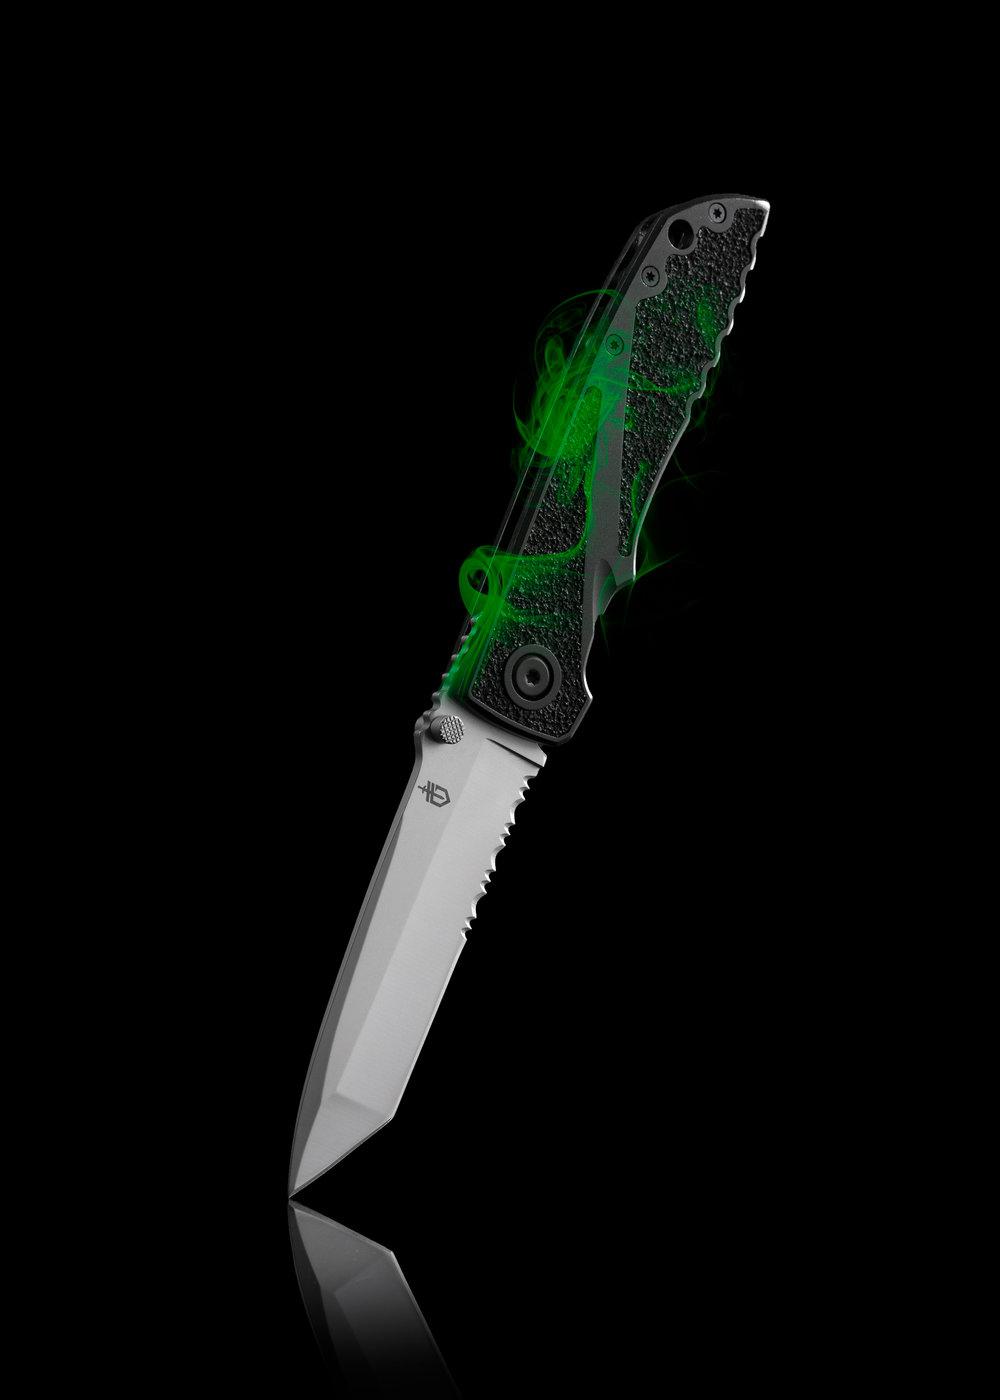 KnifeFinal.jpg